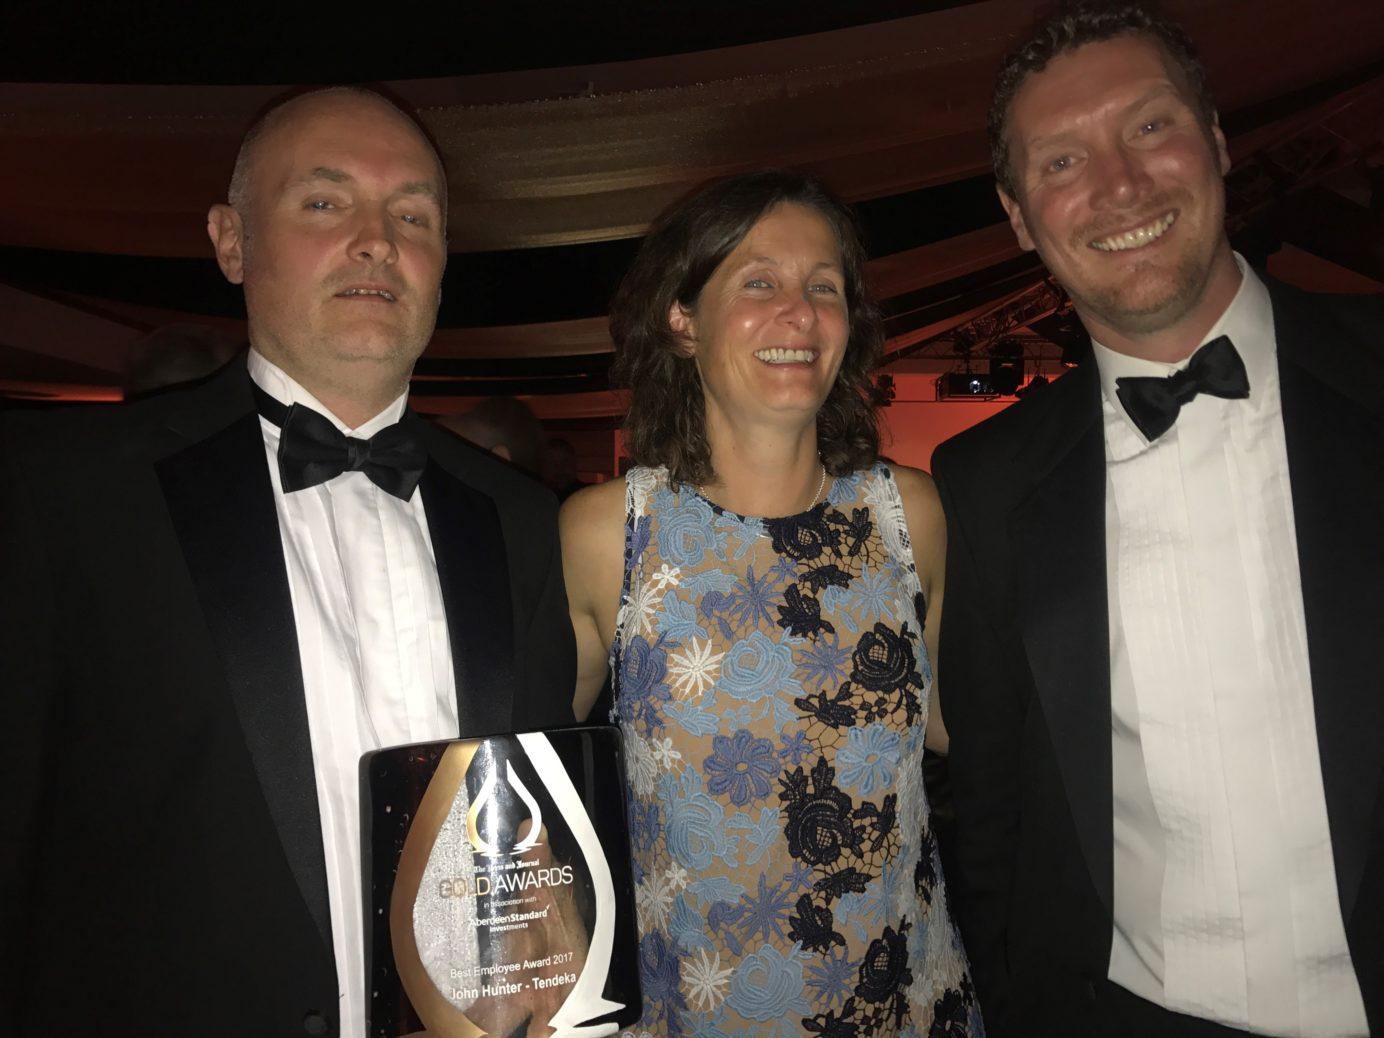 Annabel Green and 2 holidng an award